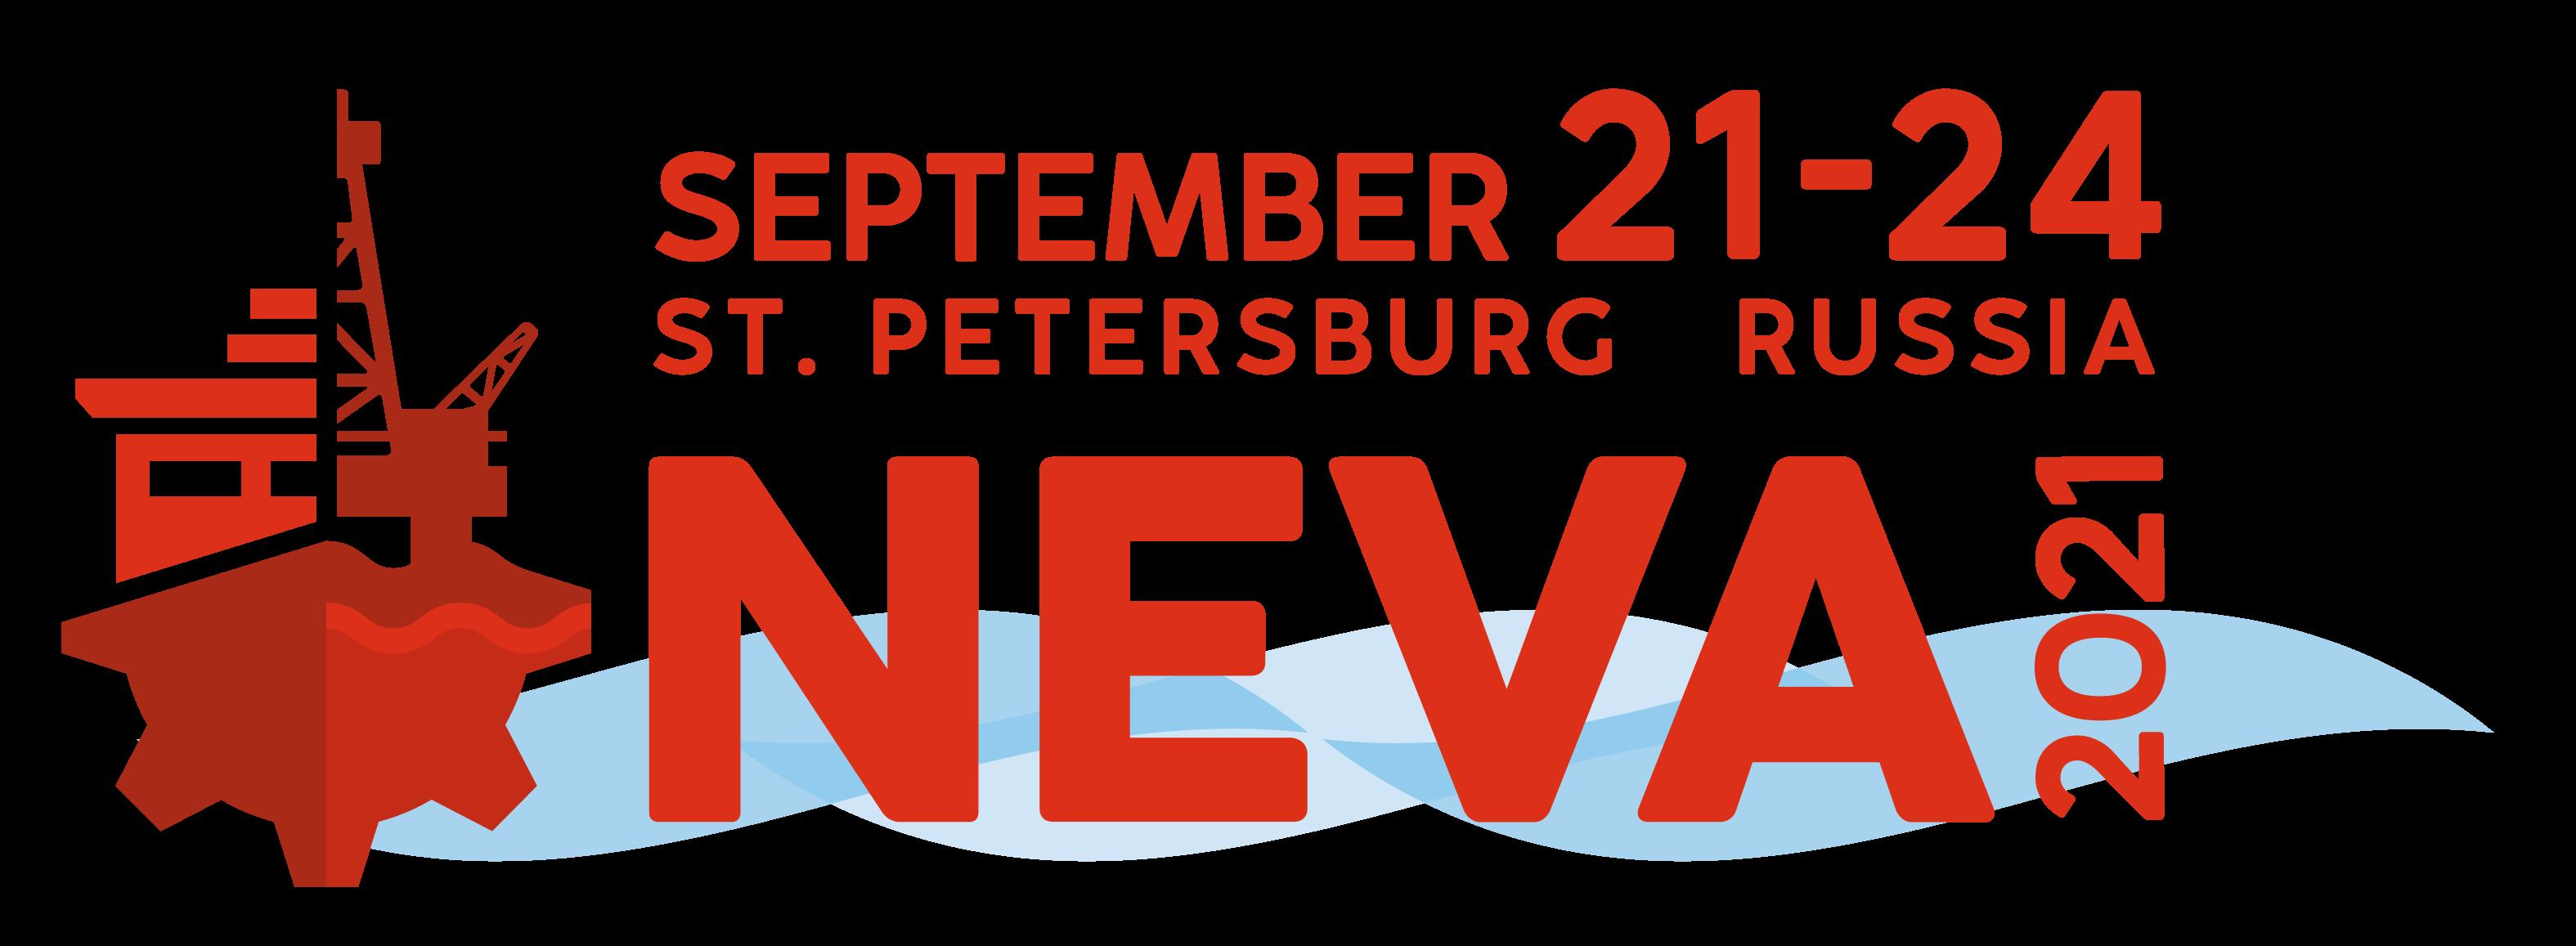 Request NEVA 2021 Exhibition Space